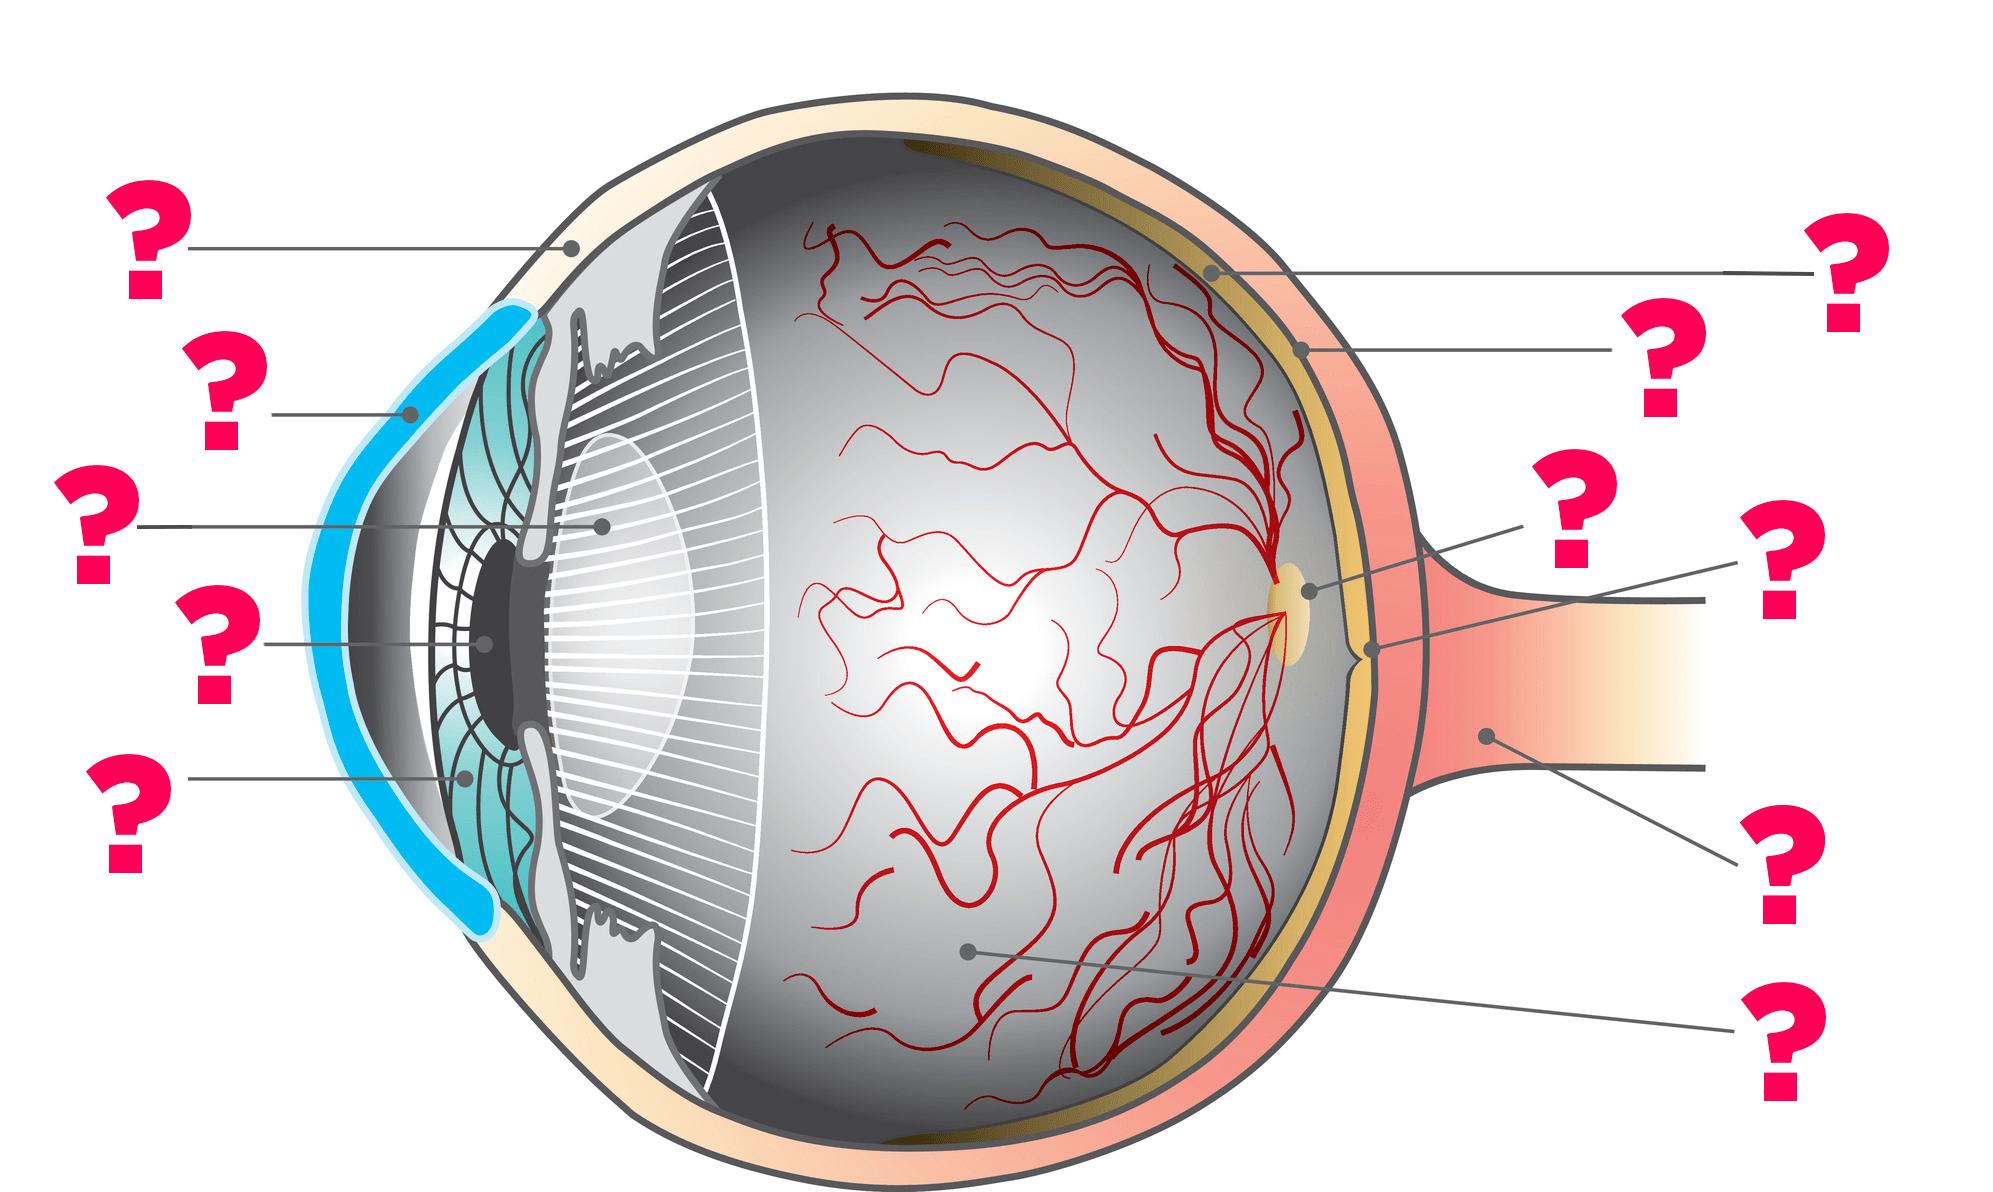 medium resolution of eye diagram for quiz wiring diagram read eye diagram quiz game